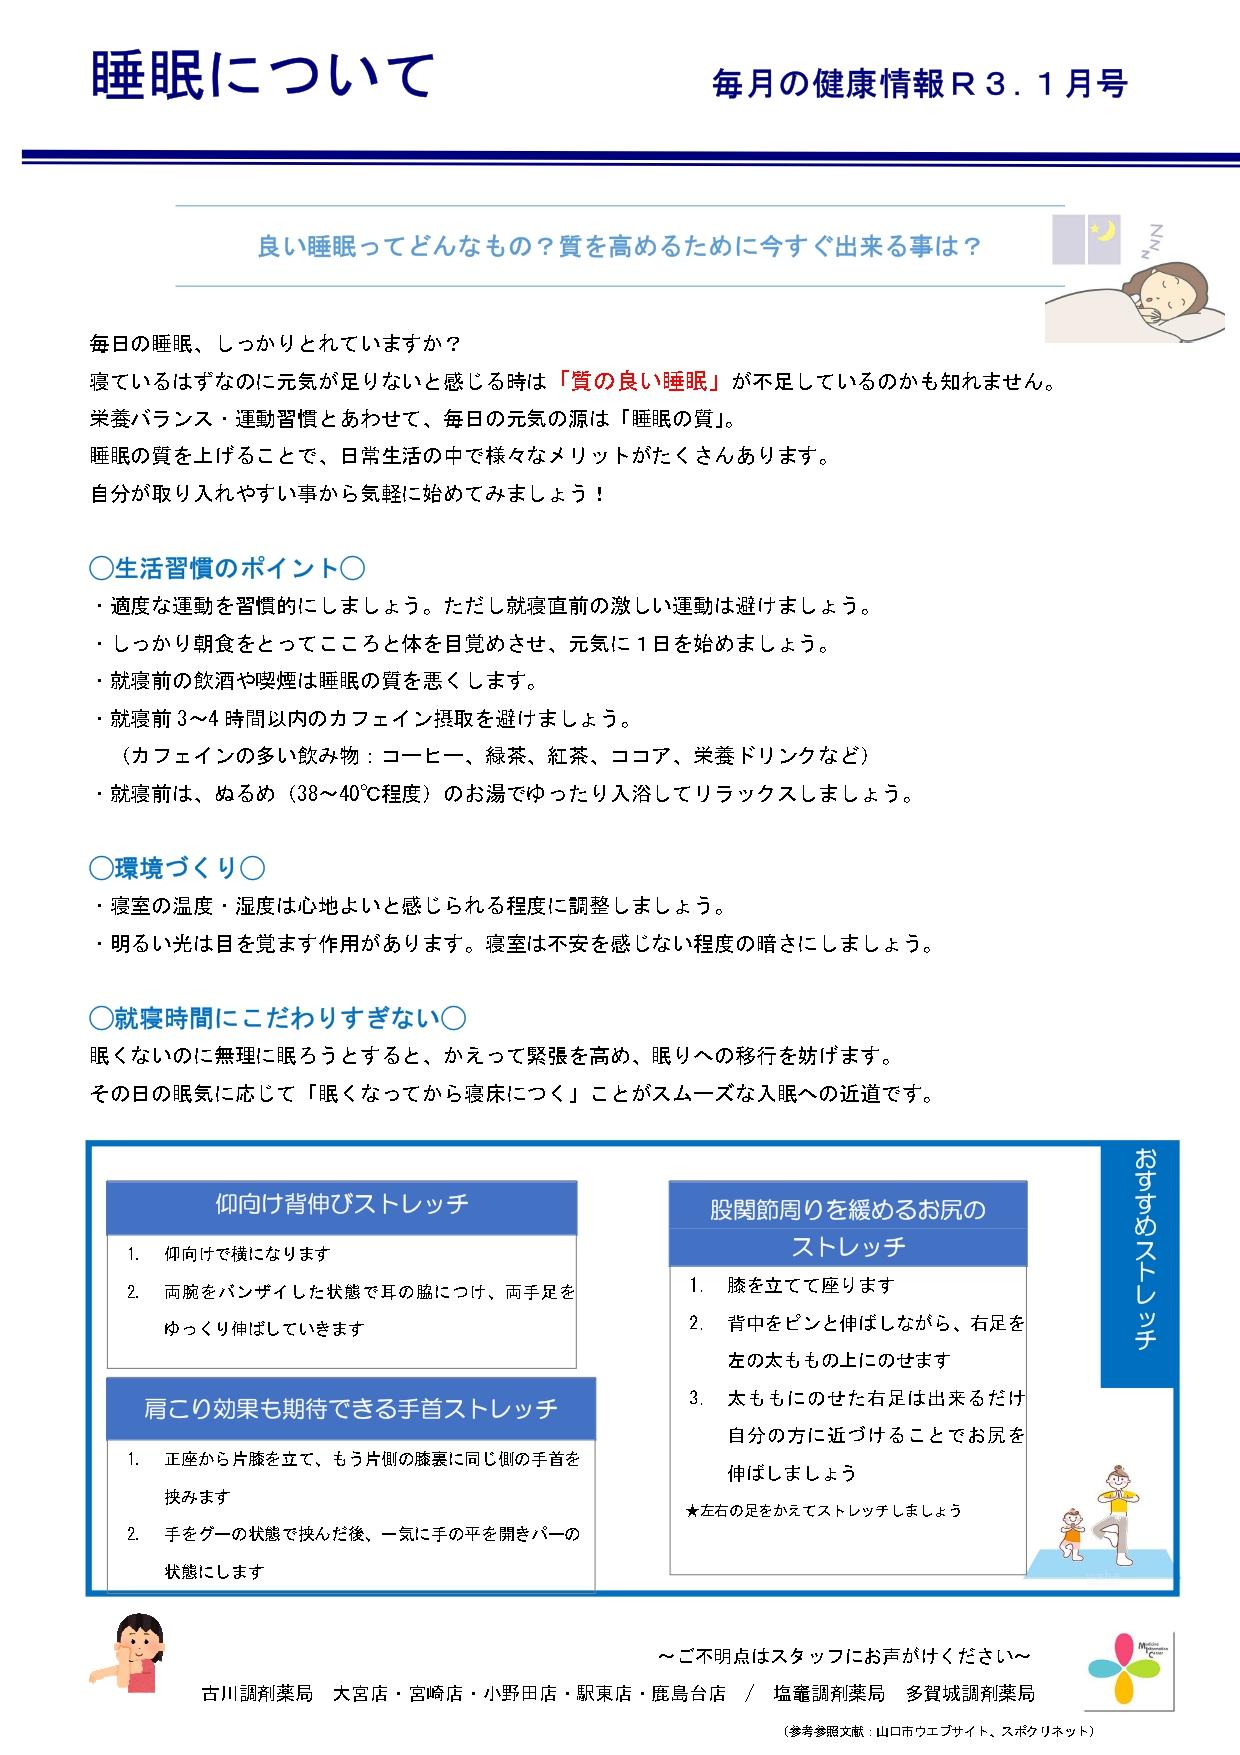 R3.1月健康情報(3)_page-0001